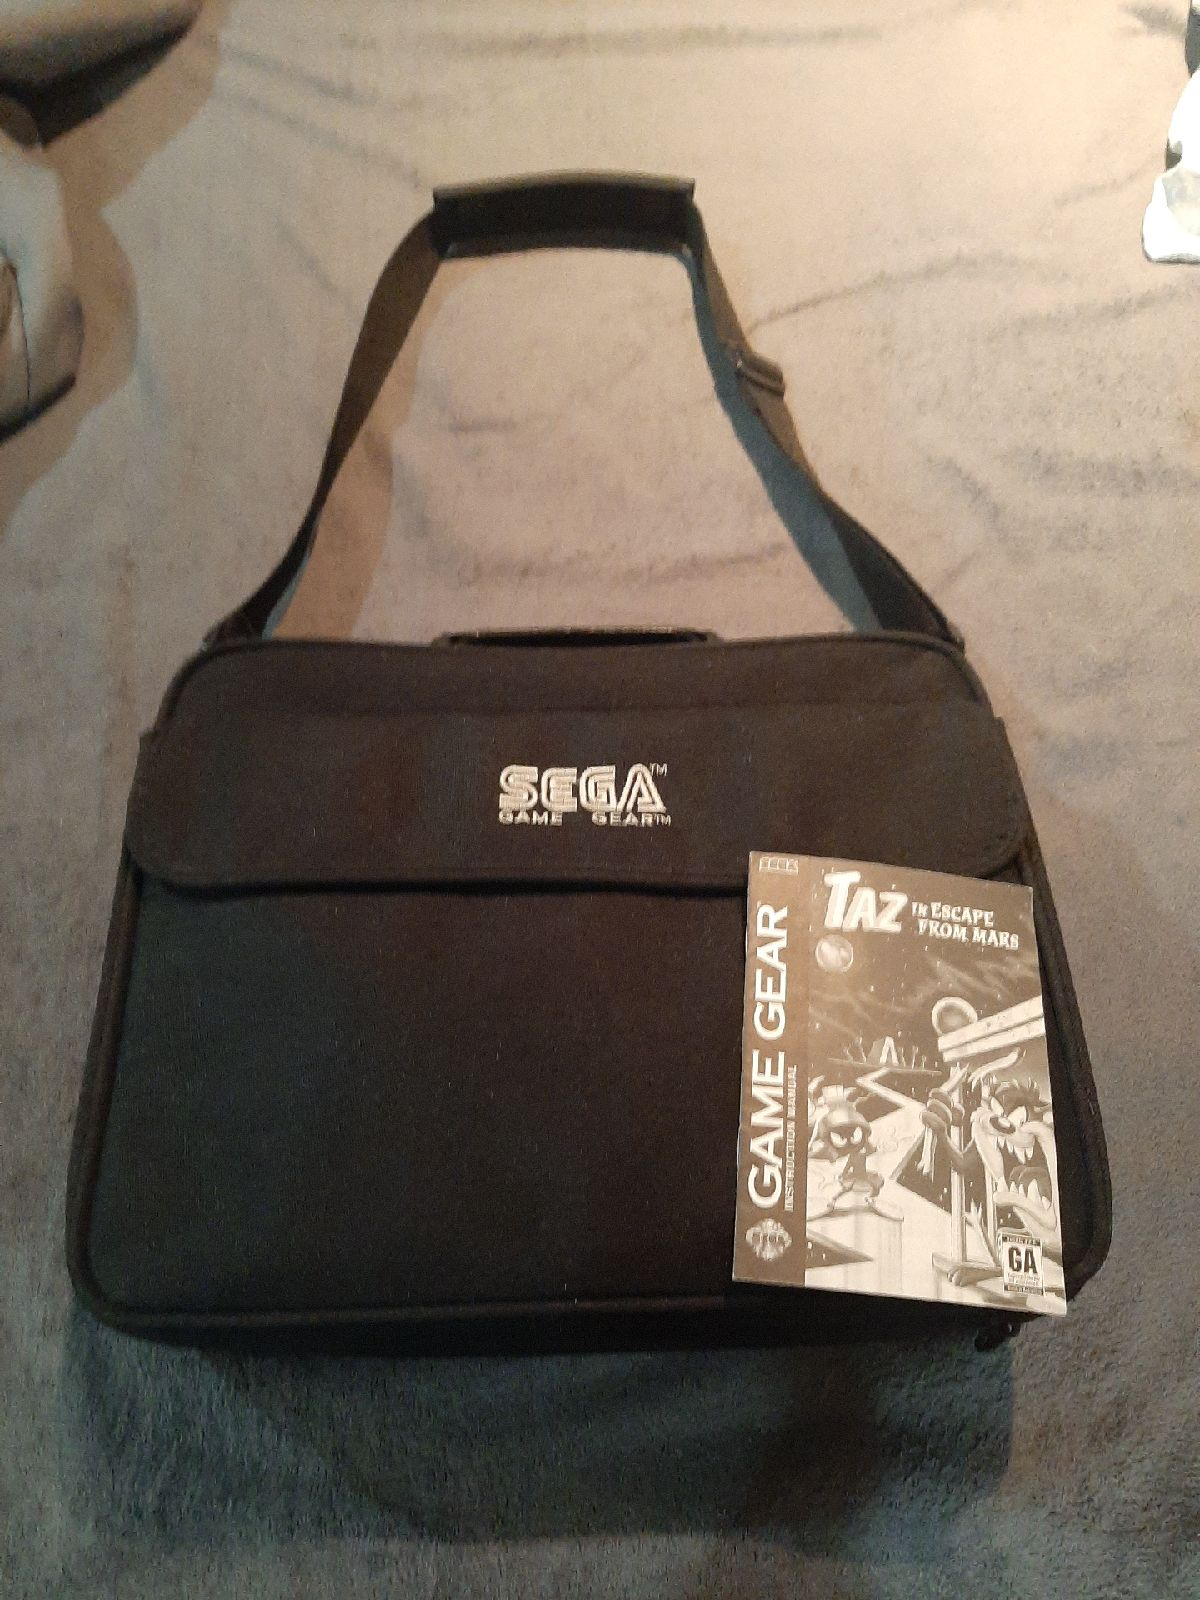 Sega gamd gear bag/organizer holder